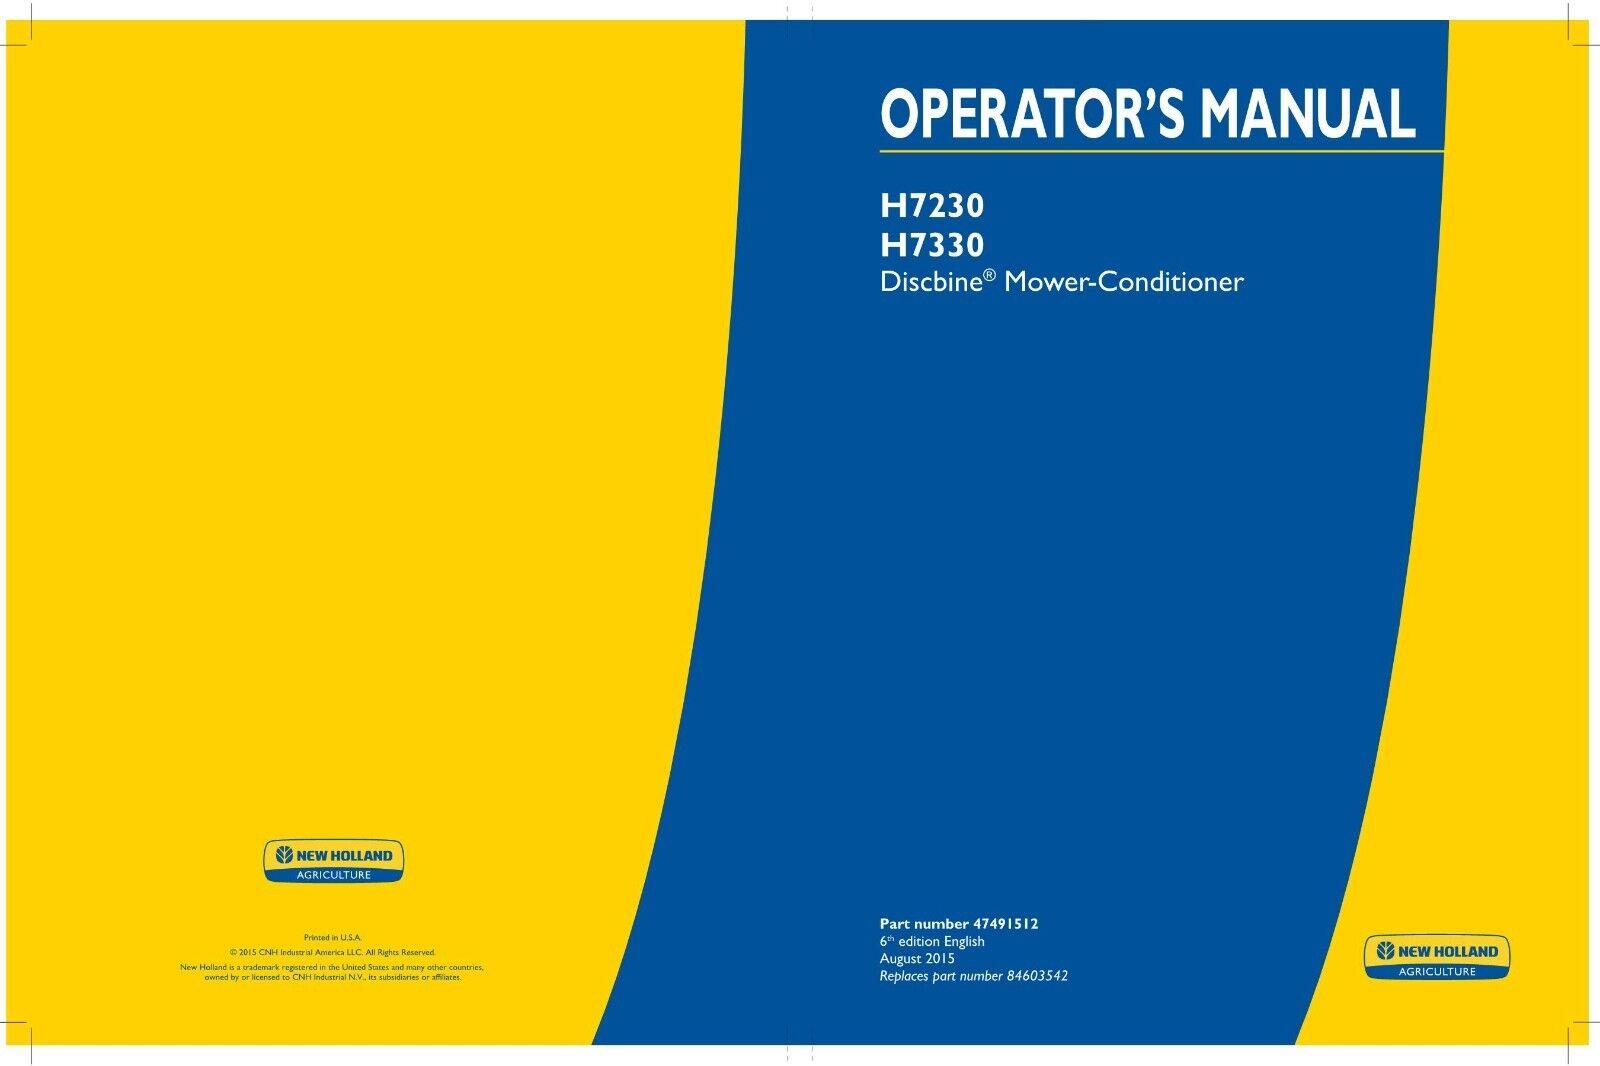 Holland H7230 & H7330 Discbine Mower-conditioner Operators Manual CD